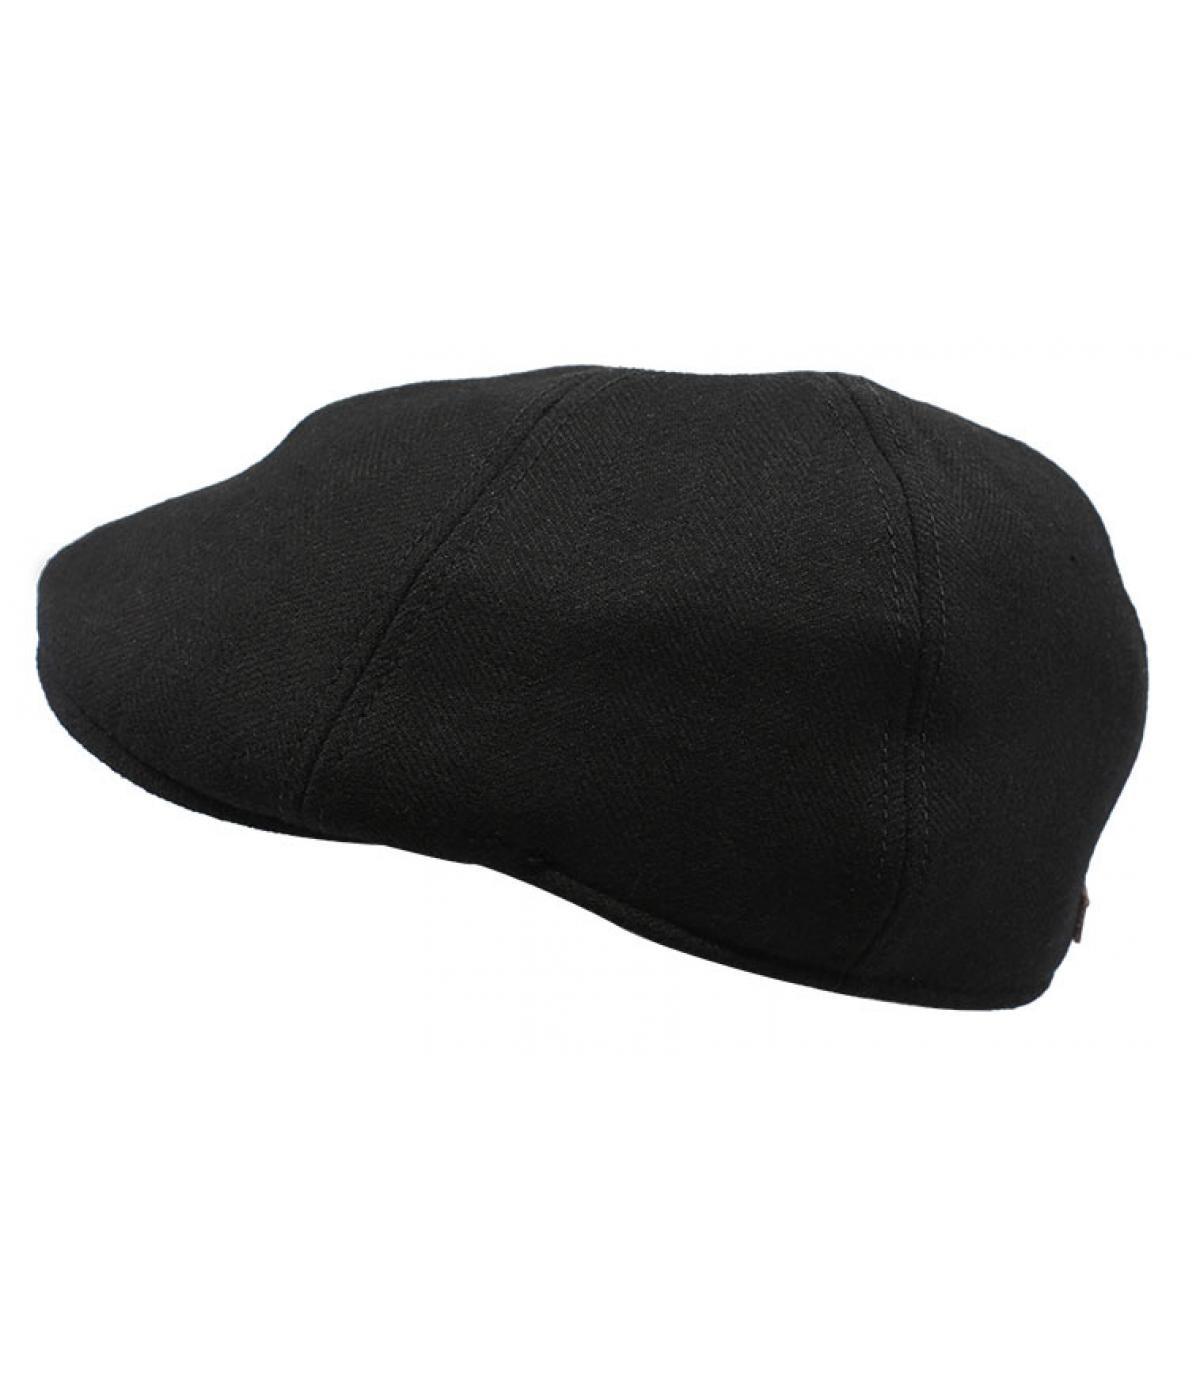 Dettagli Brentford Wool black - image 2